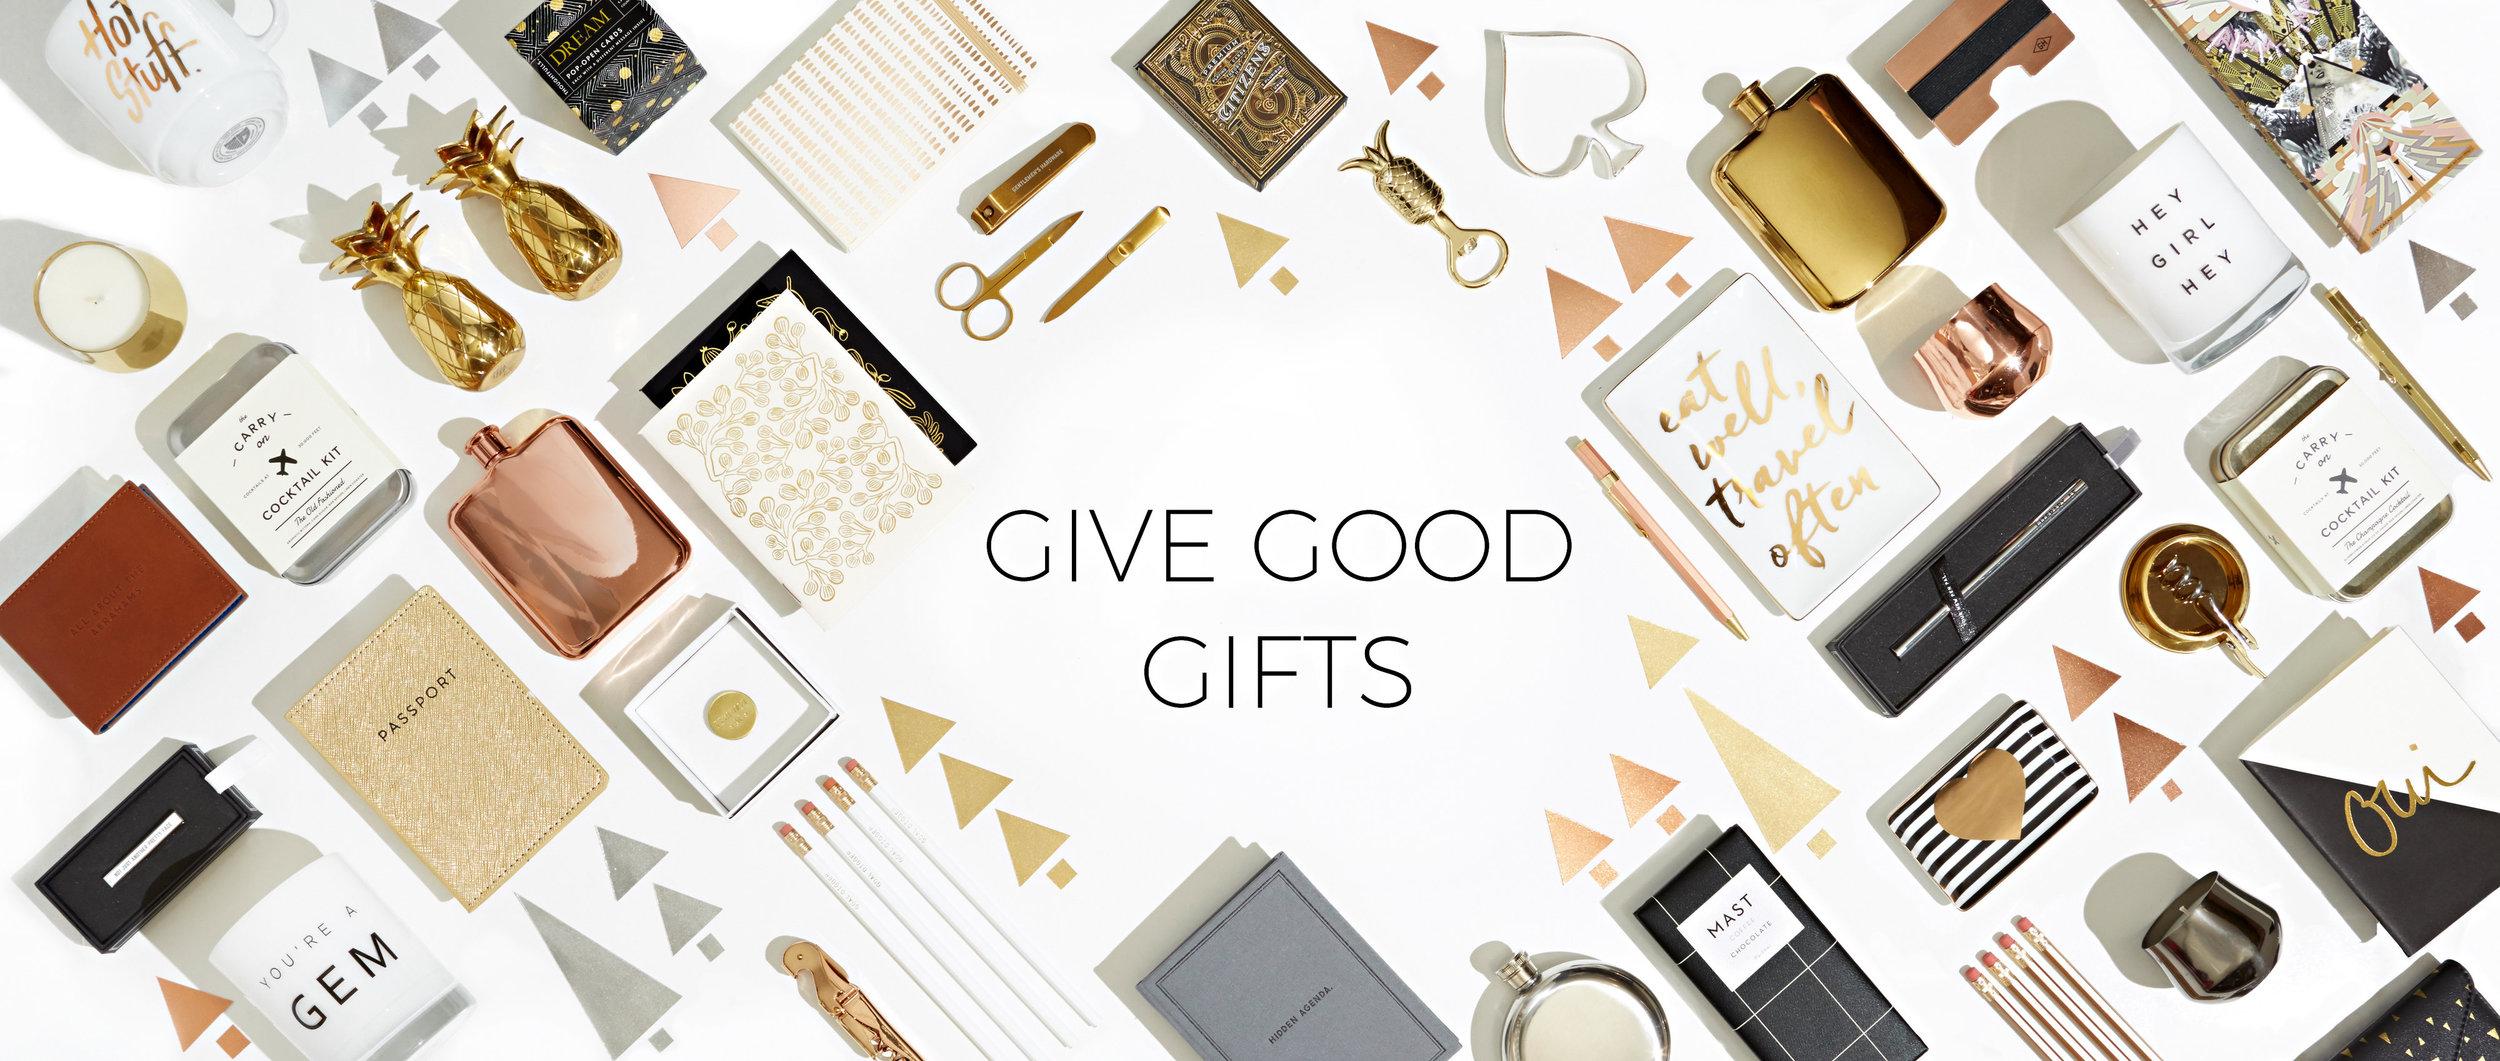 Give Good_Light_1.jpg